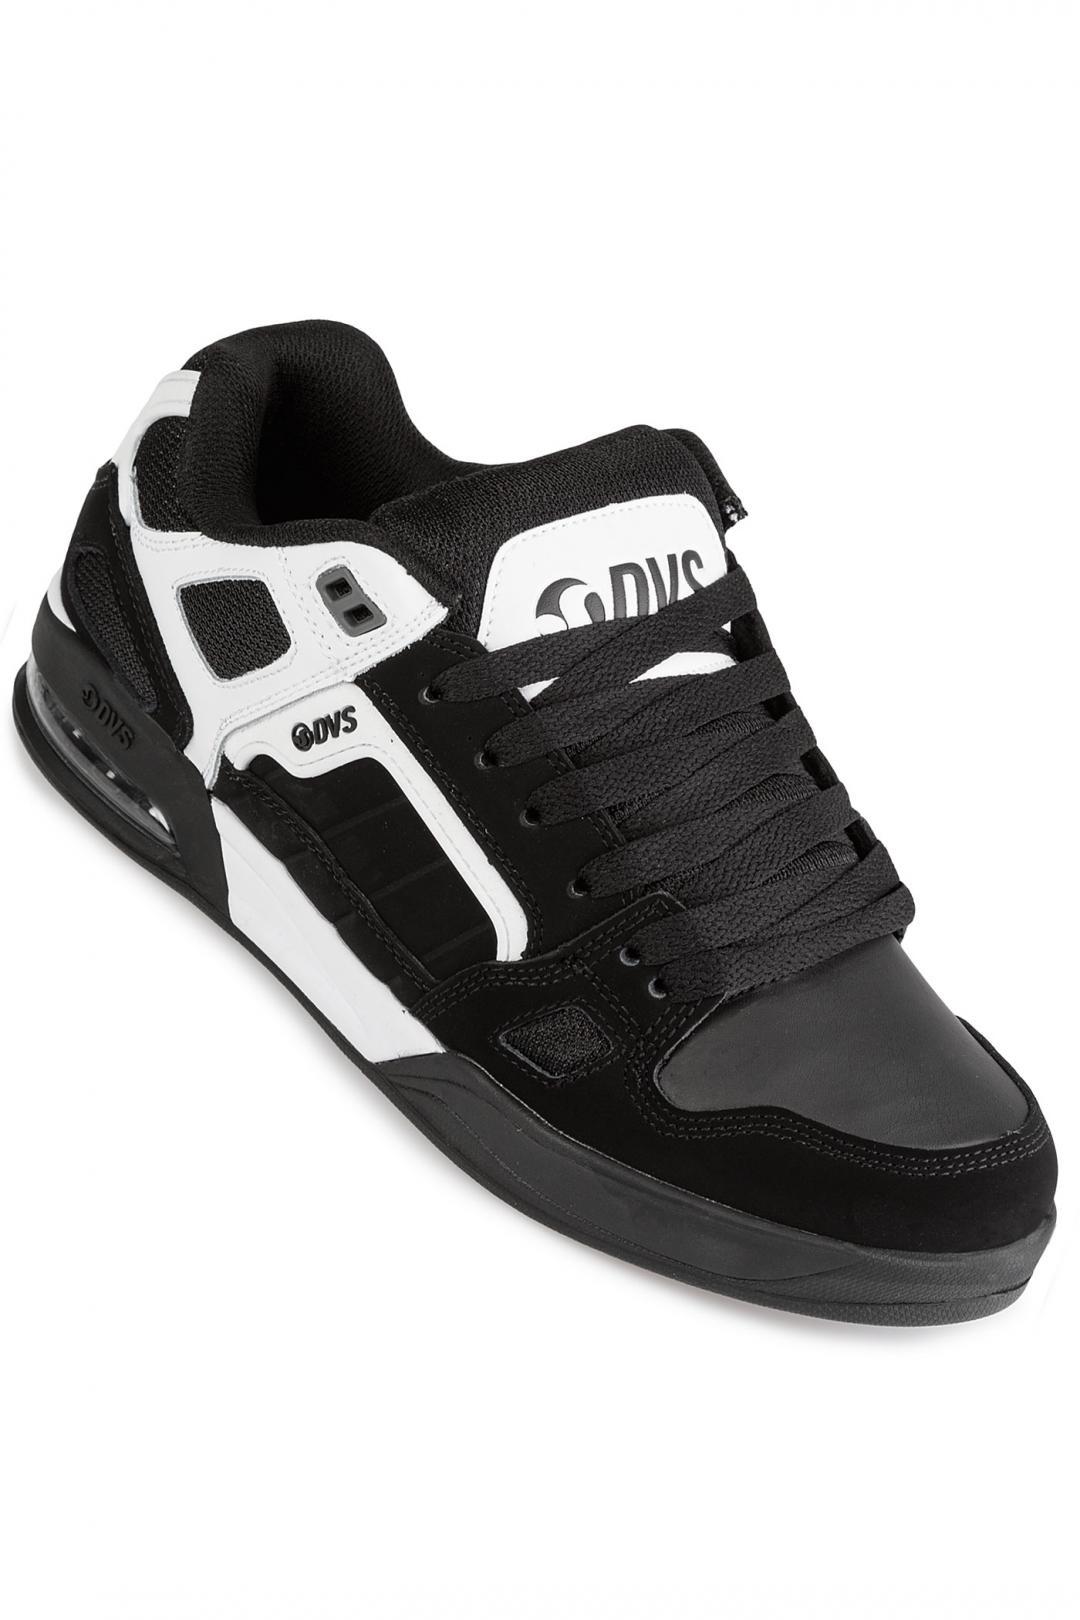 Uomo DVS Drone+ Nubuck white black   Sneaker